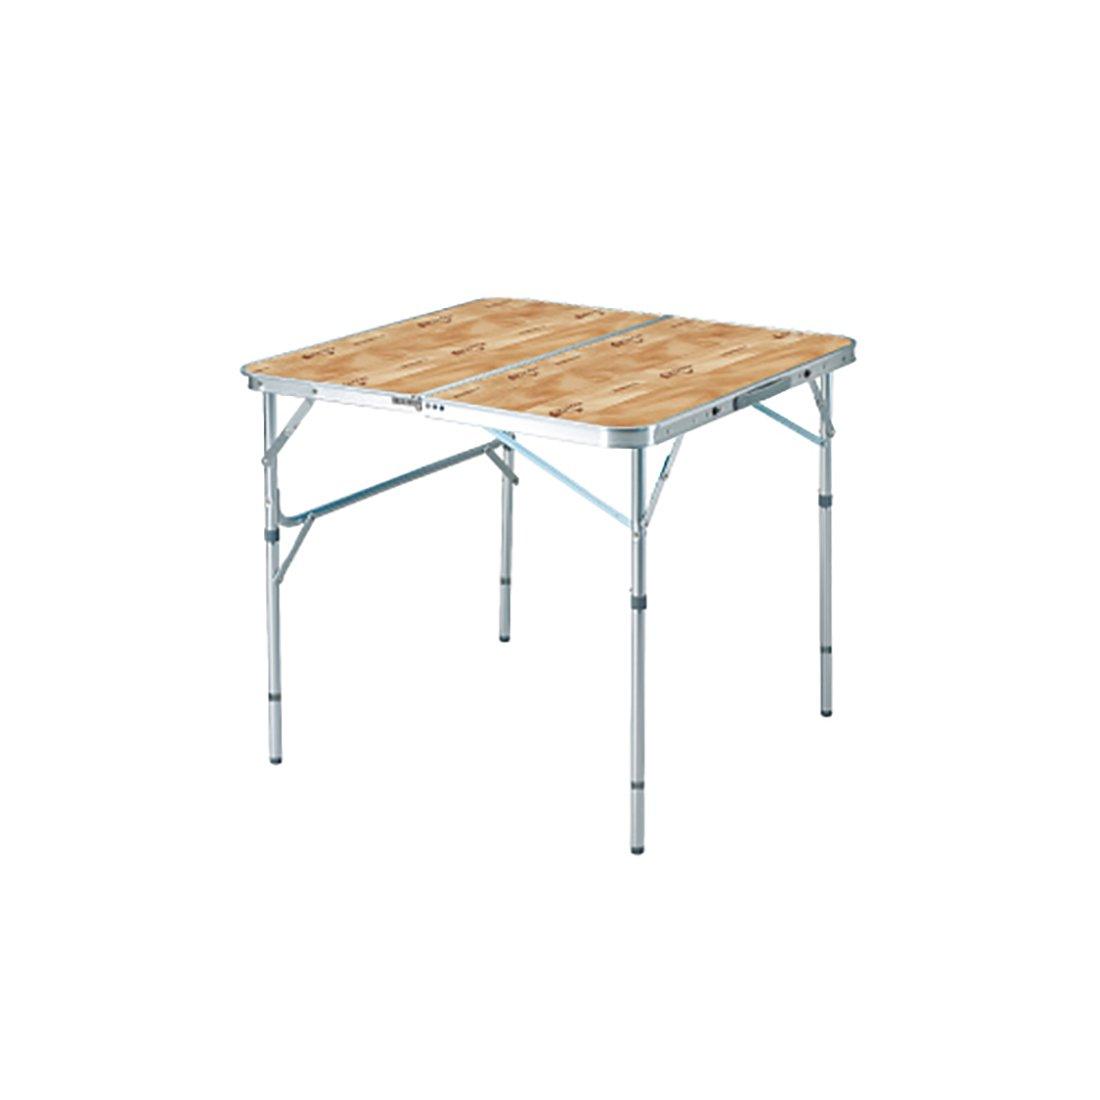 AL Slim2 folding table